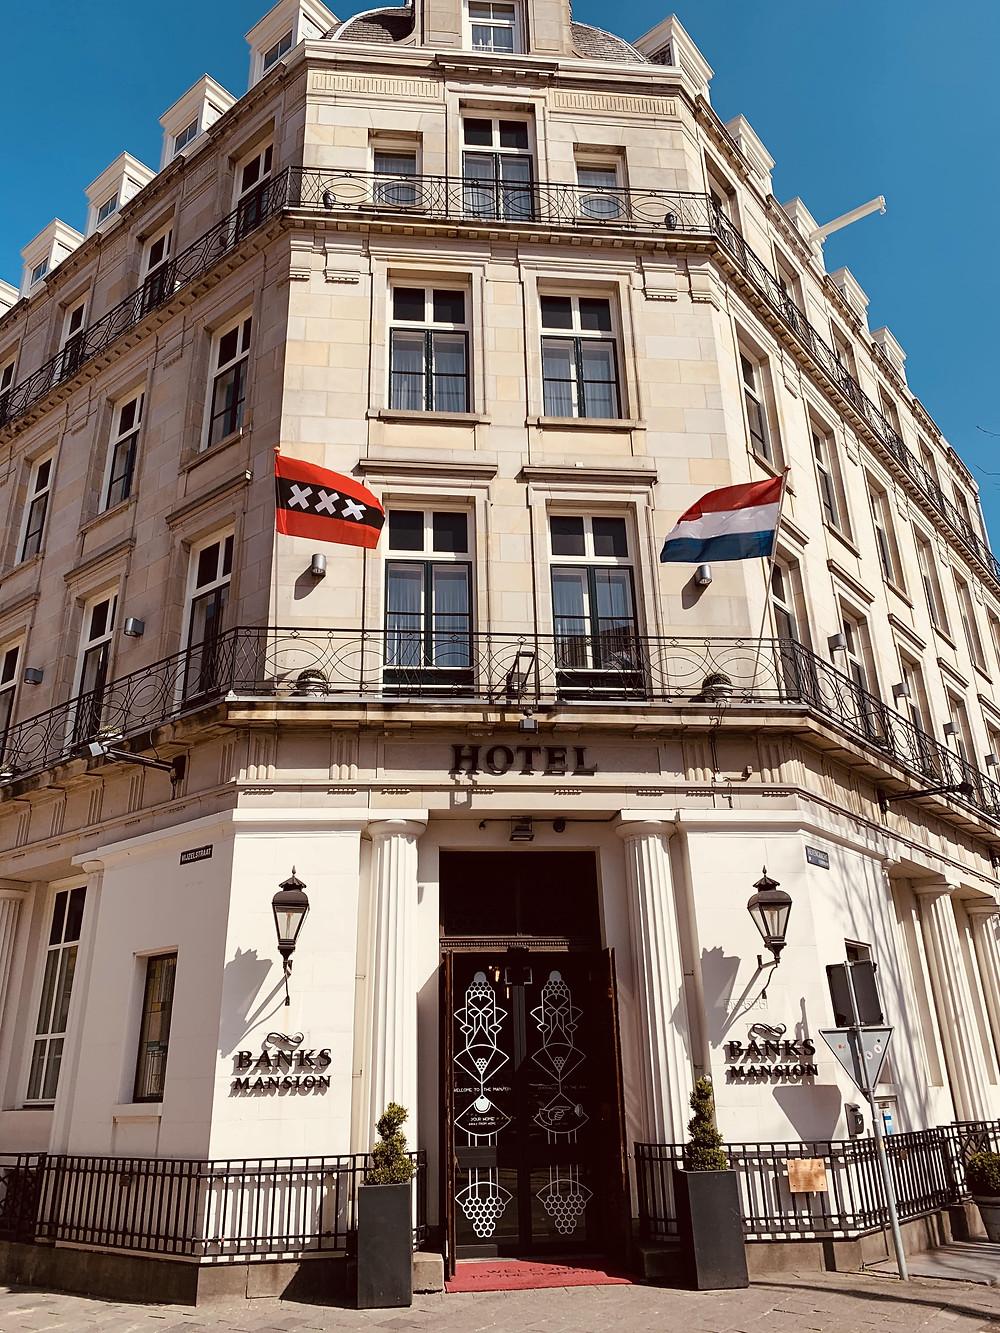 Banks Mansion Carlton Hotel Amsterdam - The Netherlands